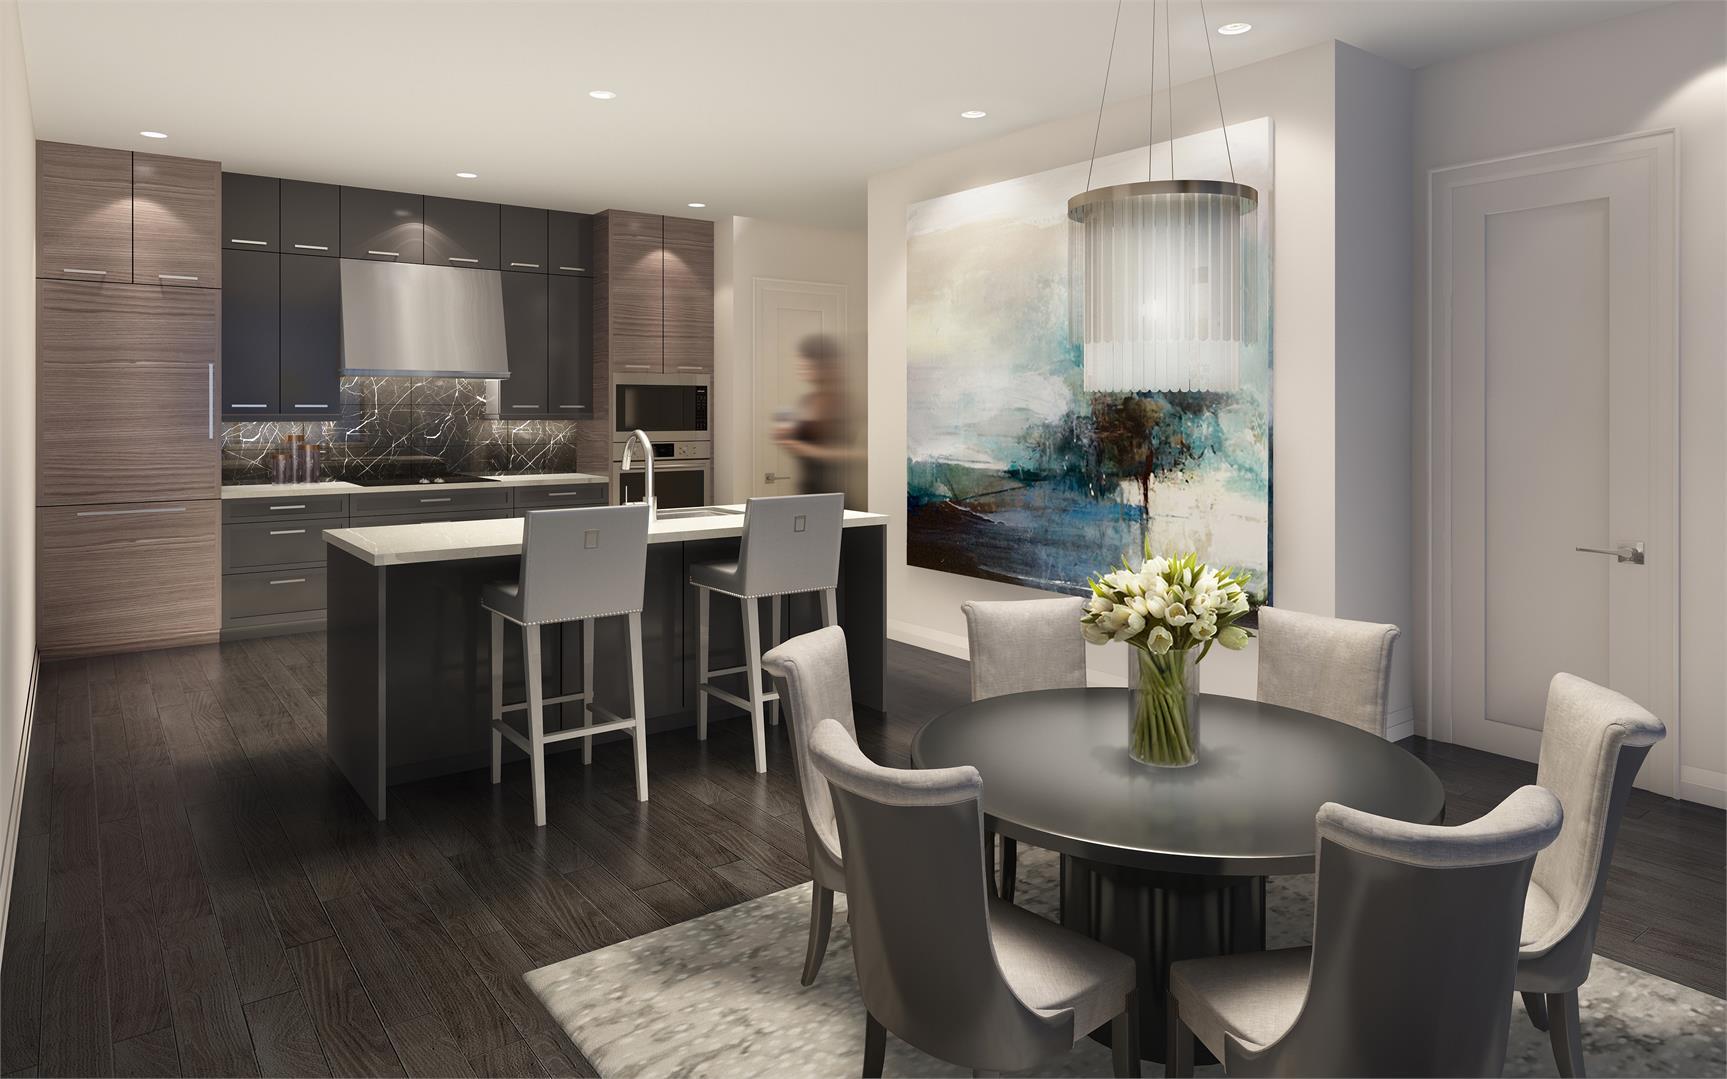 Interior photo of 42 Mill Street Condos - Phase 1